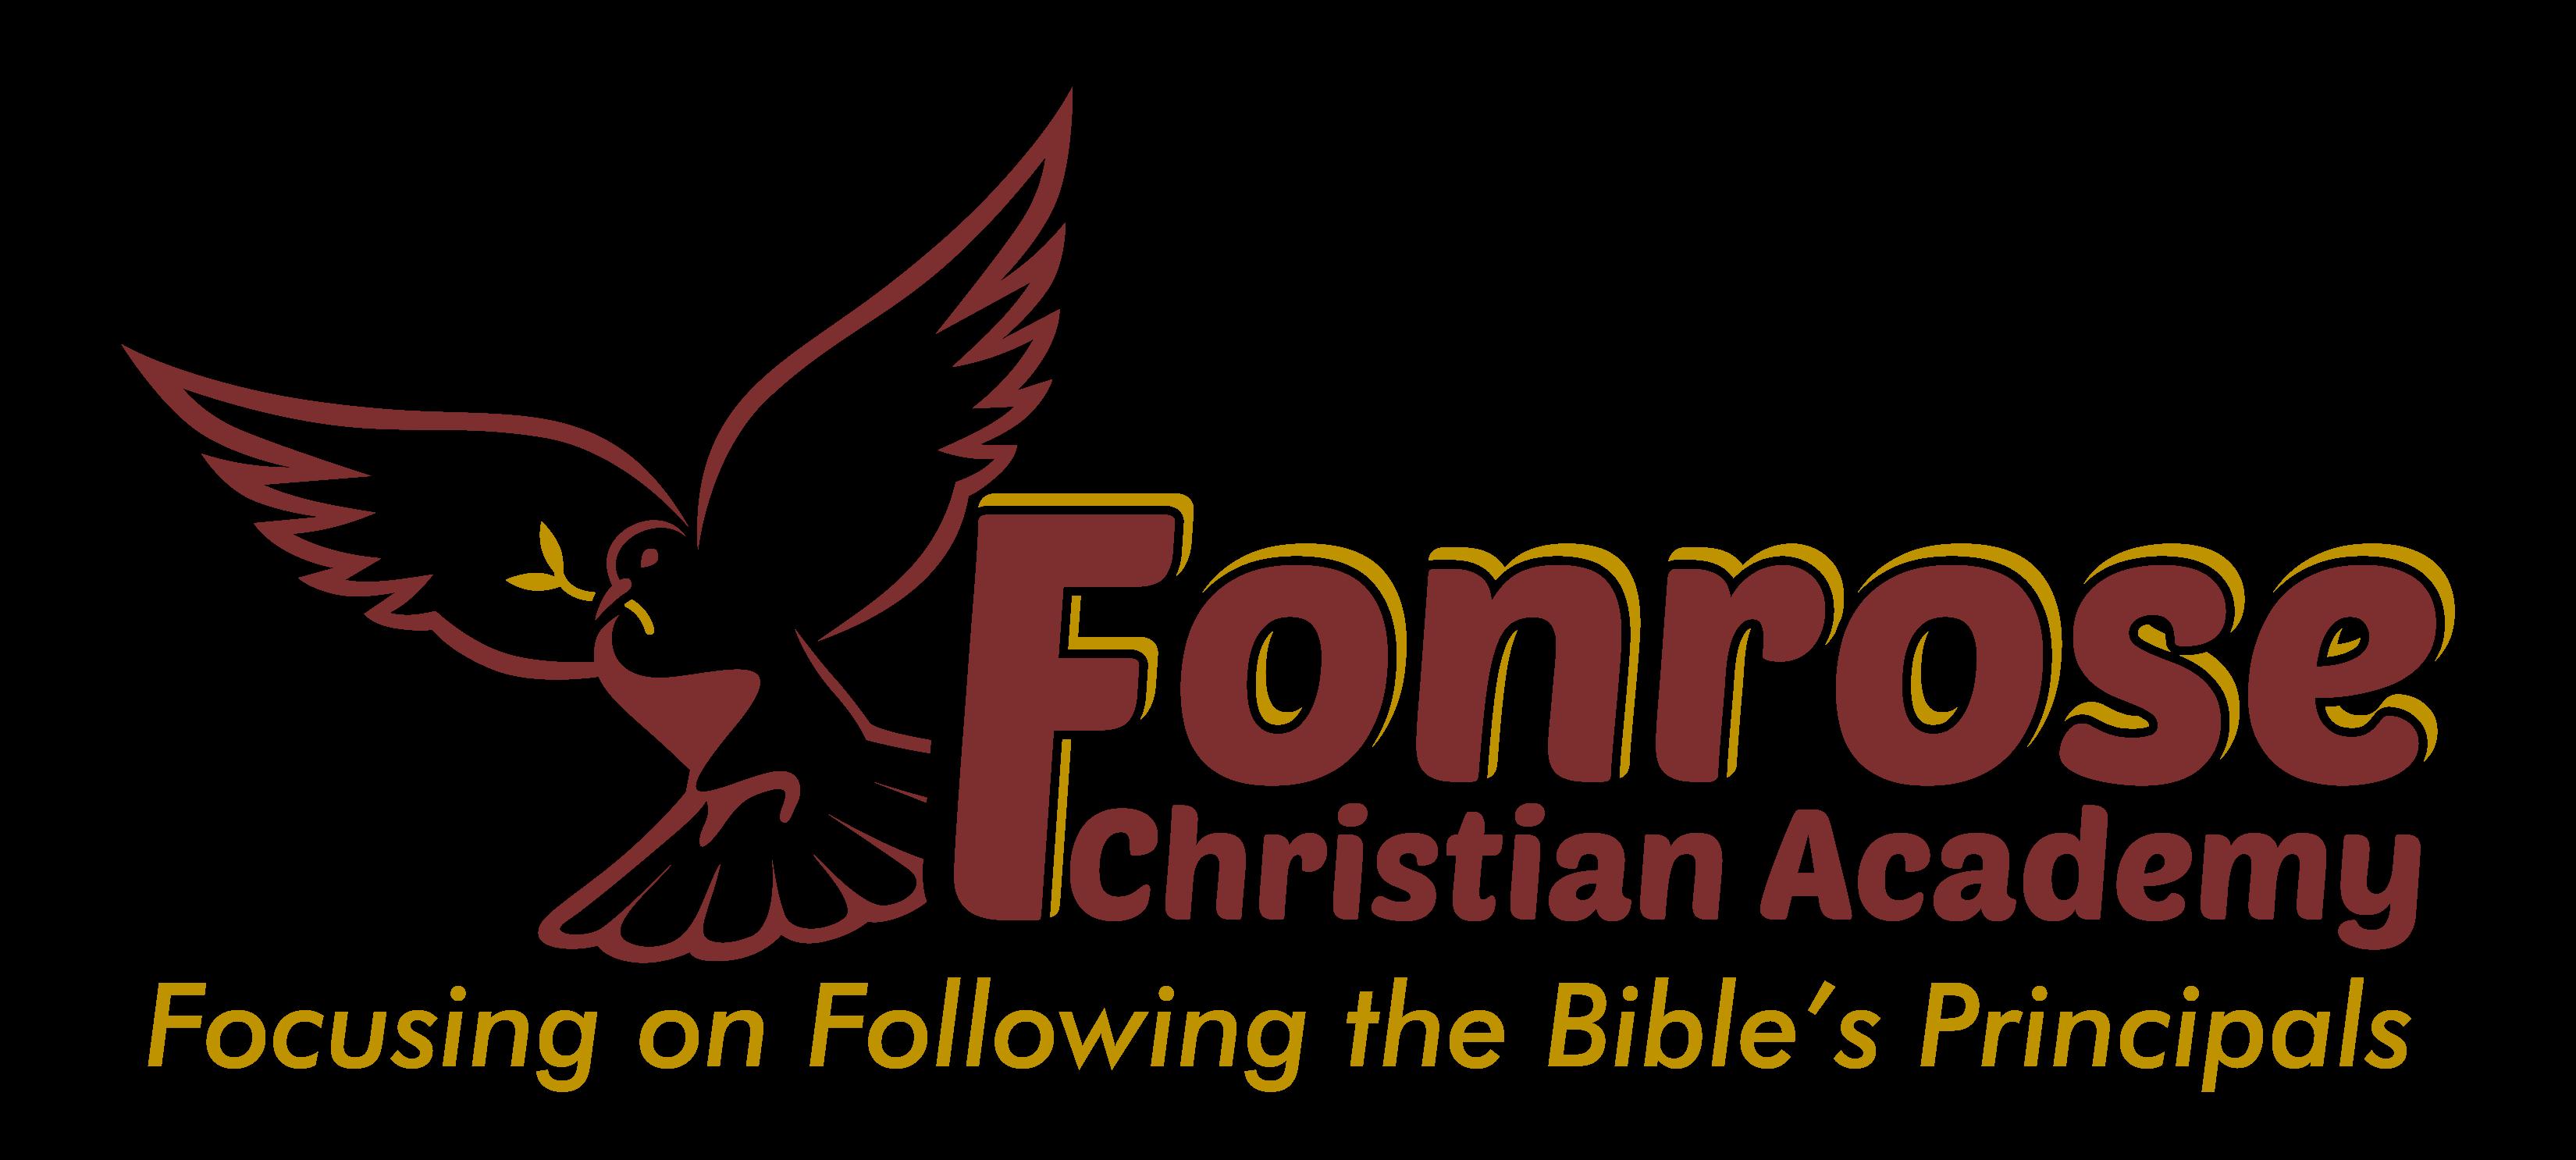 Fonrose Christian Preschool & Academy